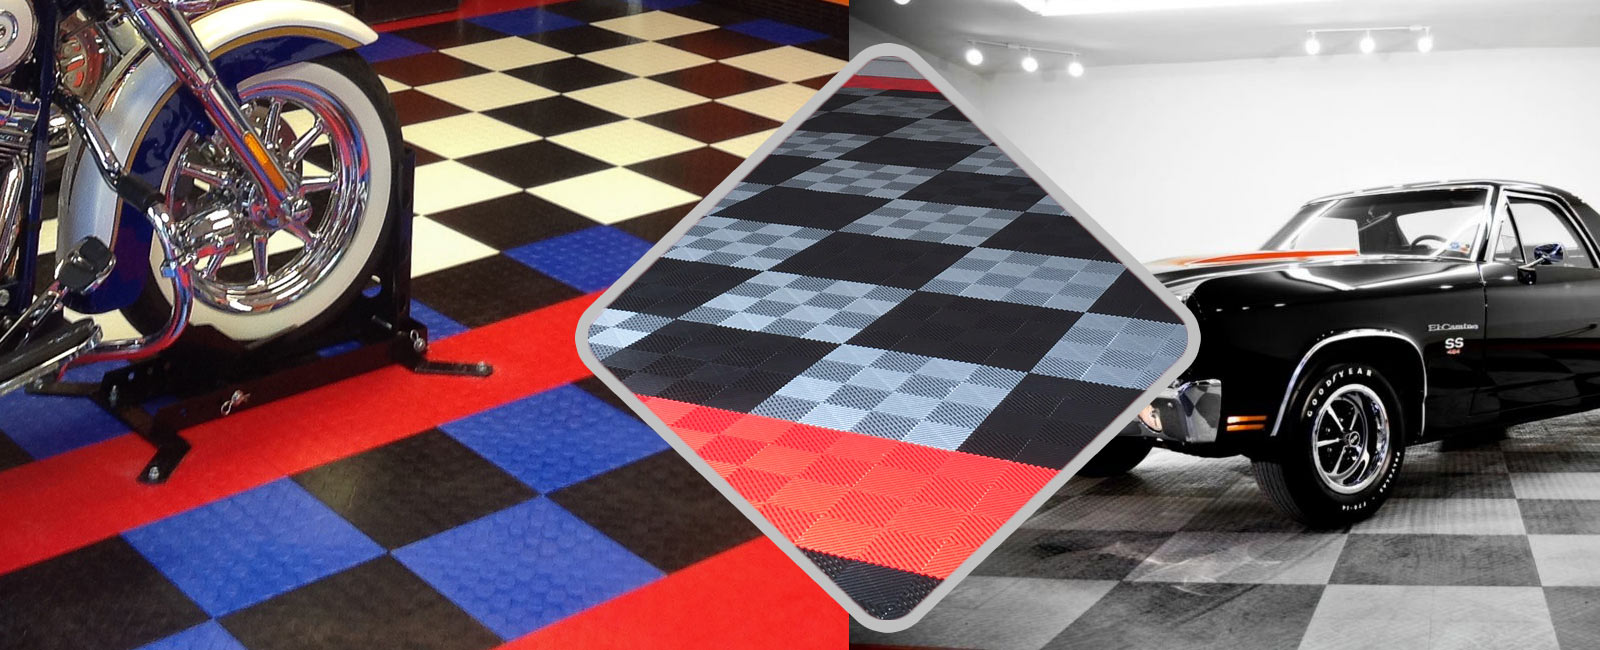 RaceDeck & Snaplock flooring